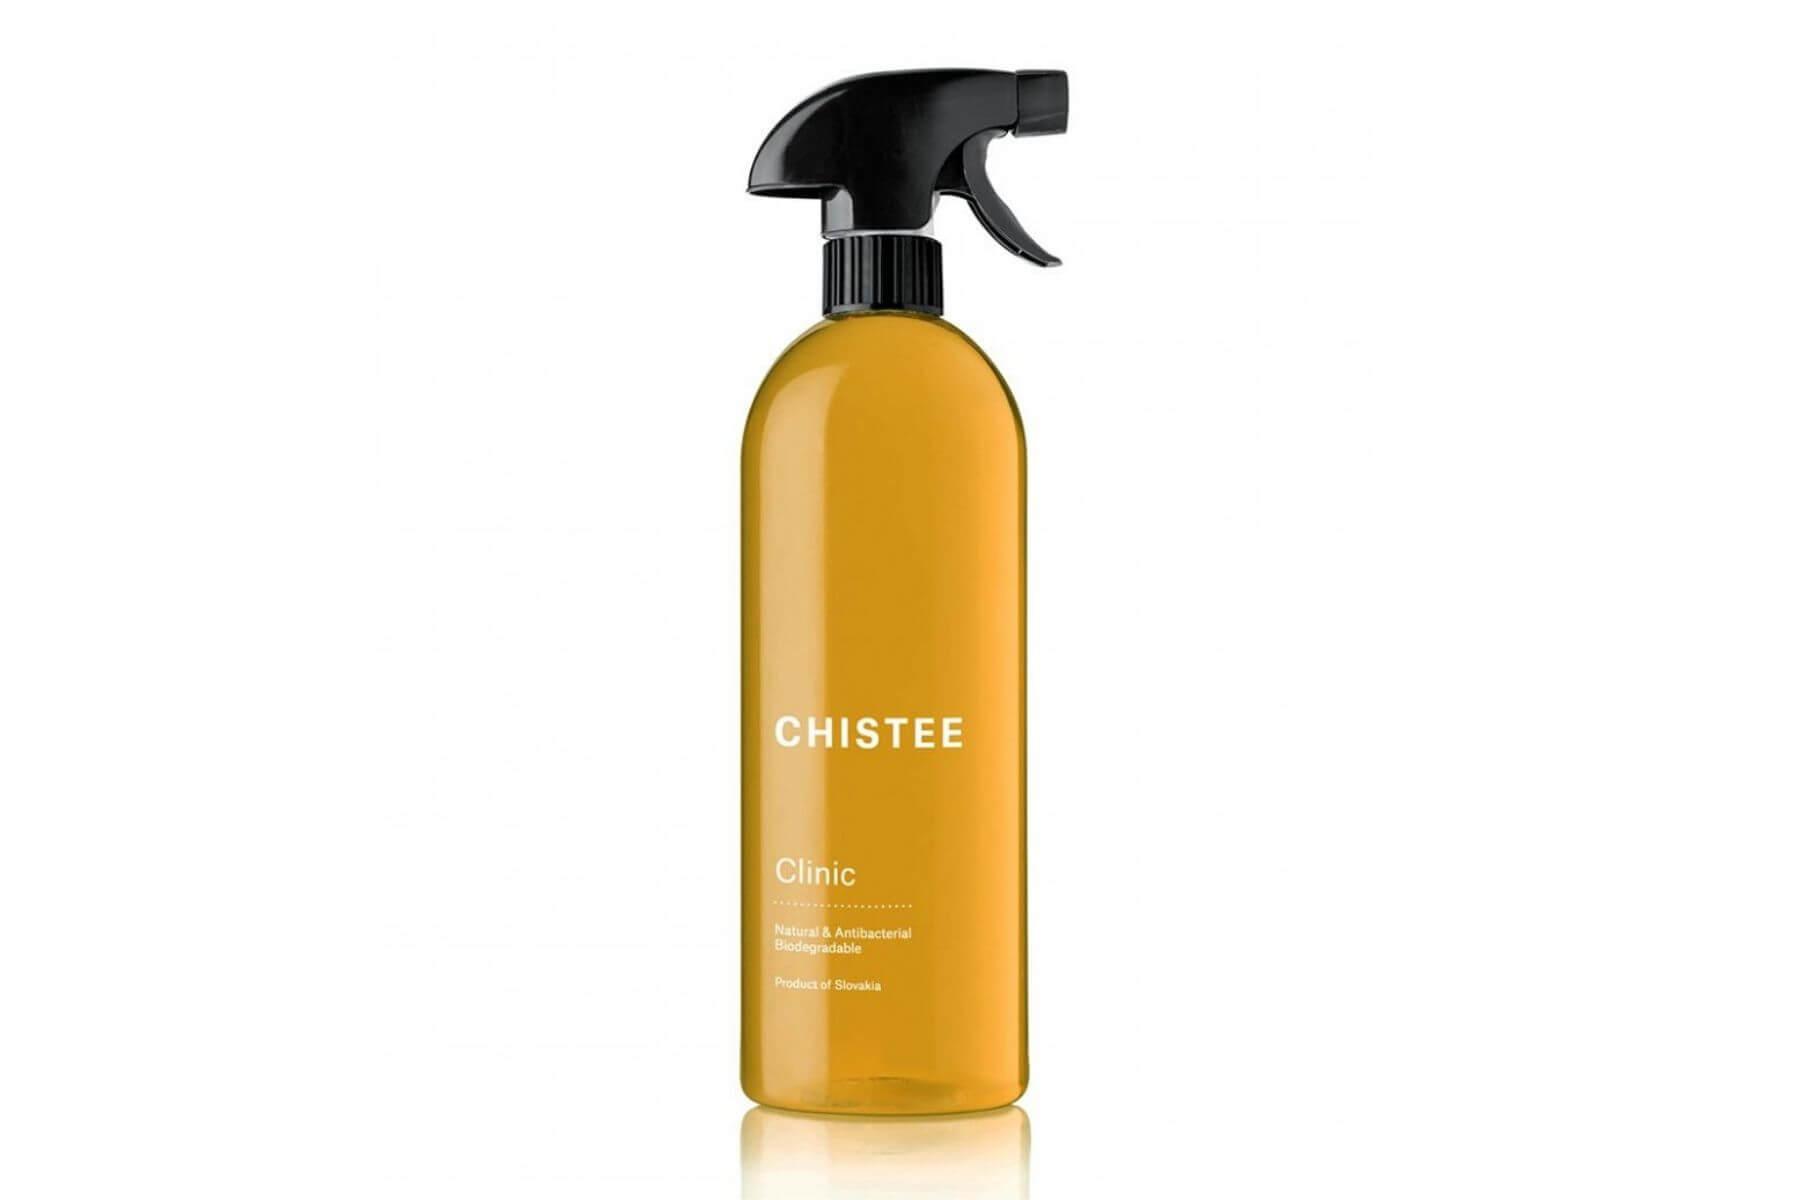 CHISTEE Clinic Spray 1050 ml